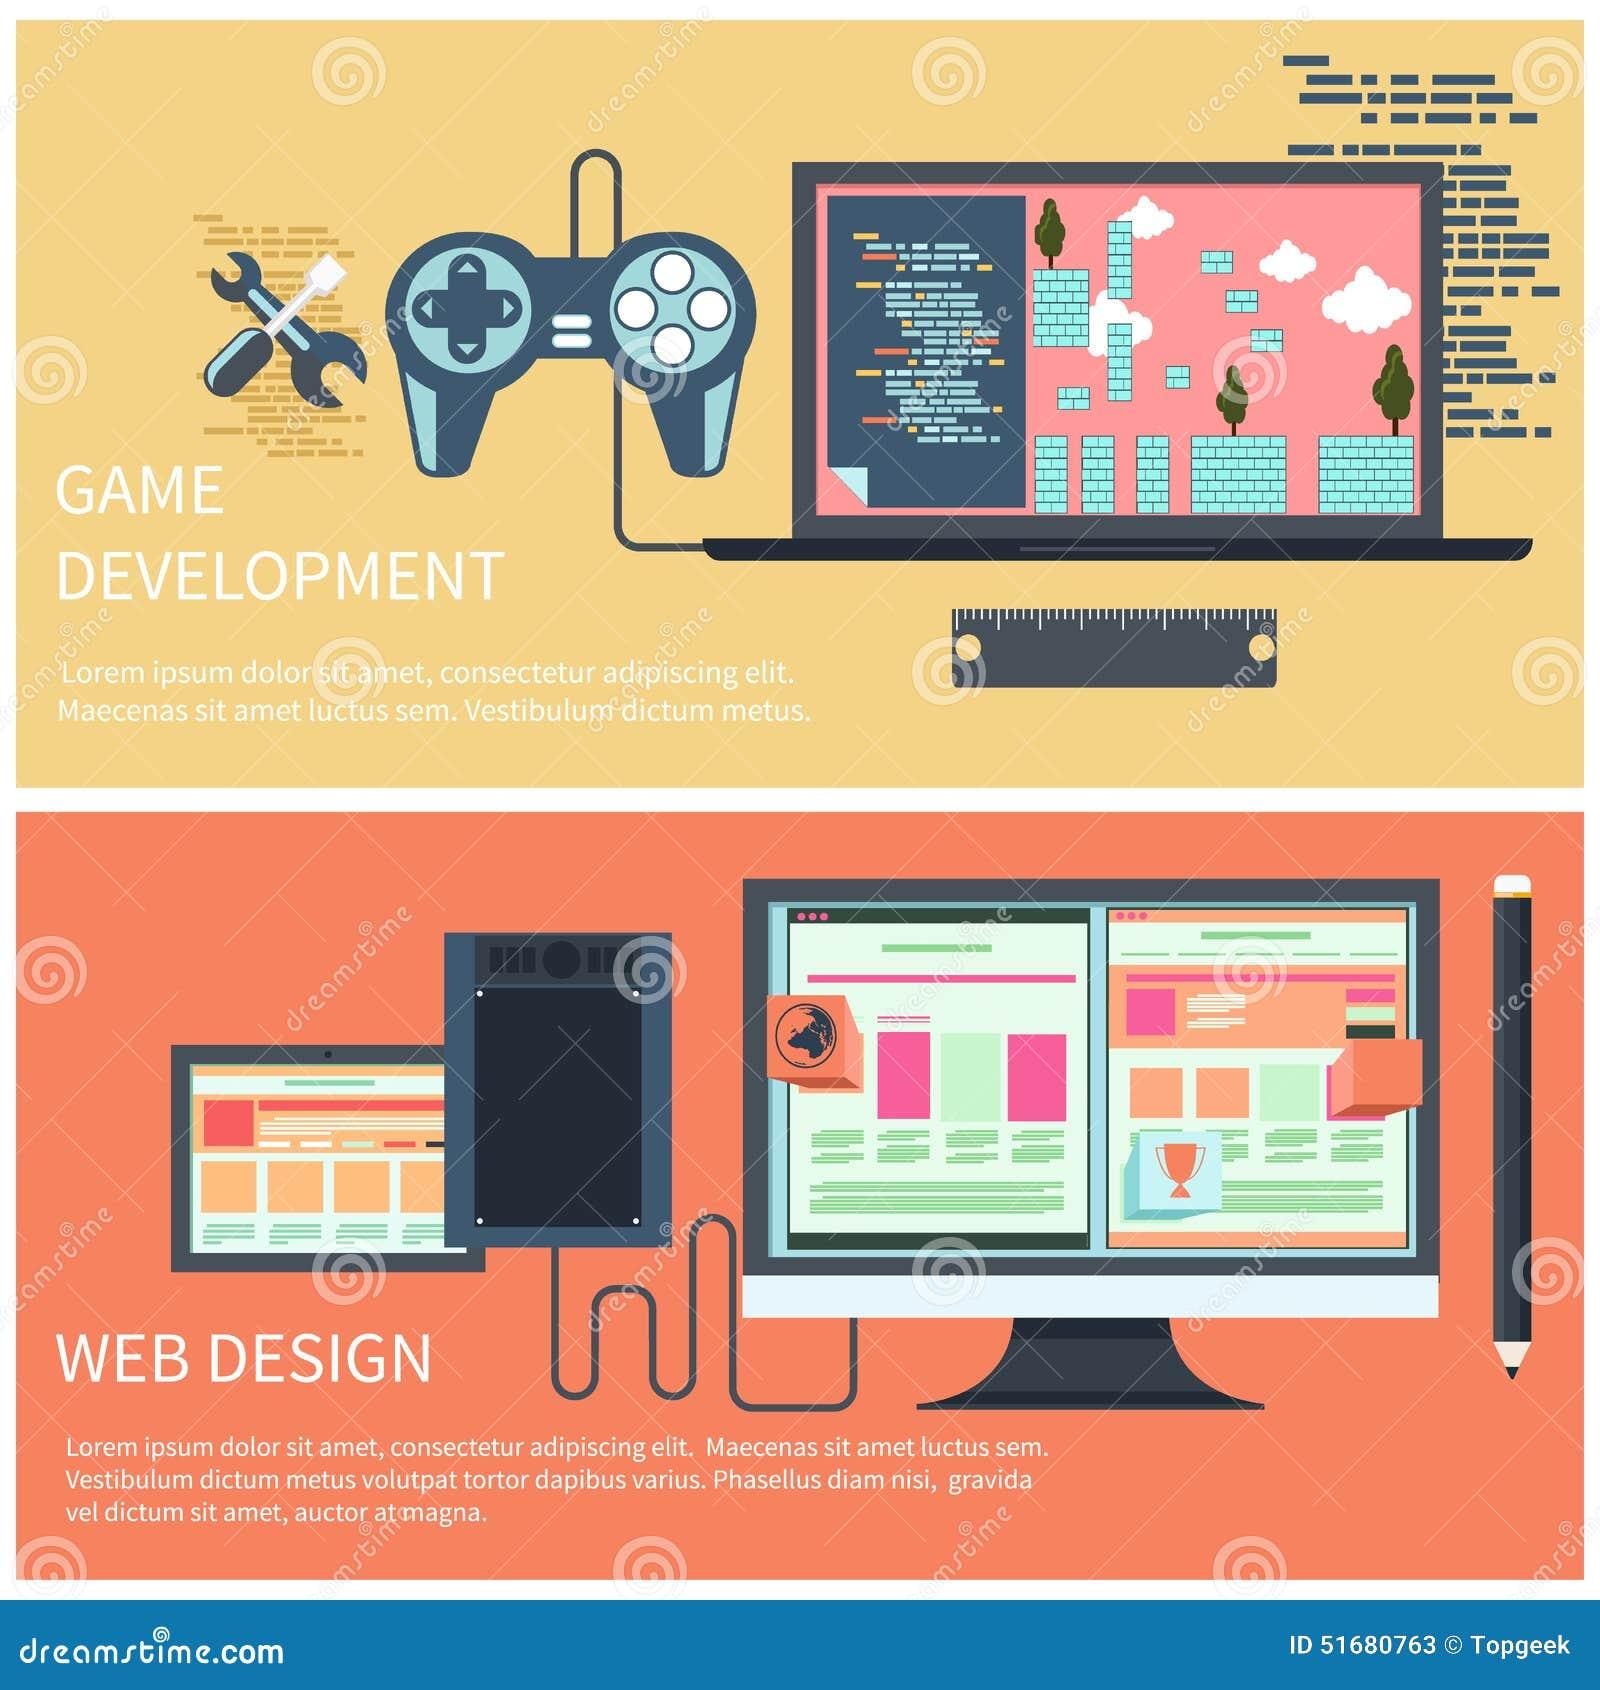 Web Design And Development Concept Cartoon Vector